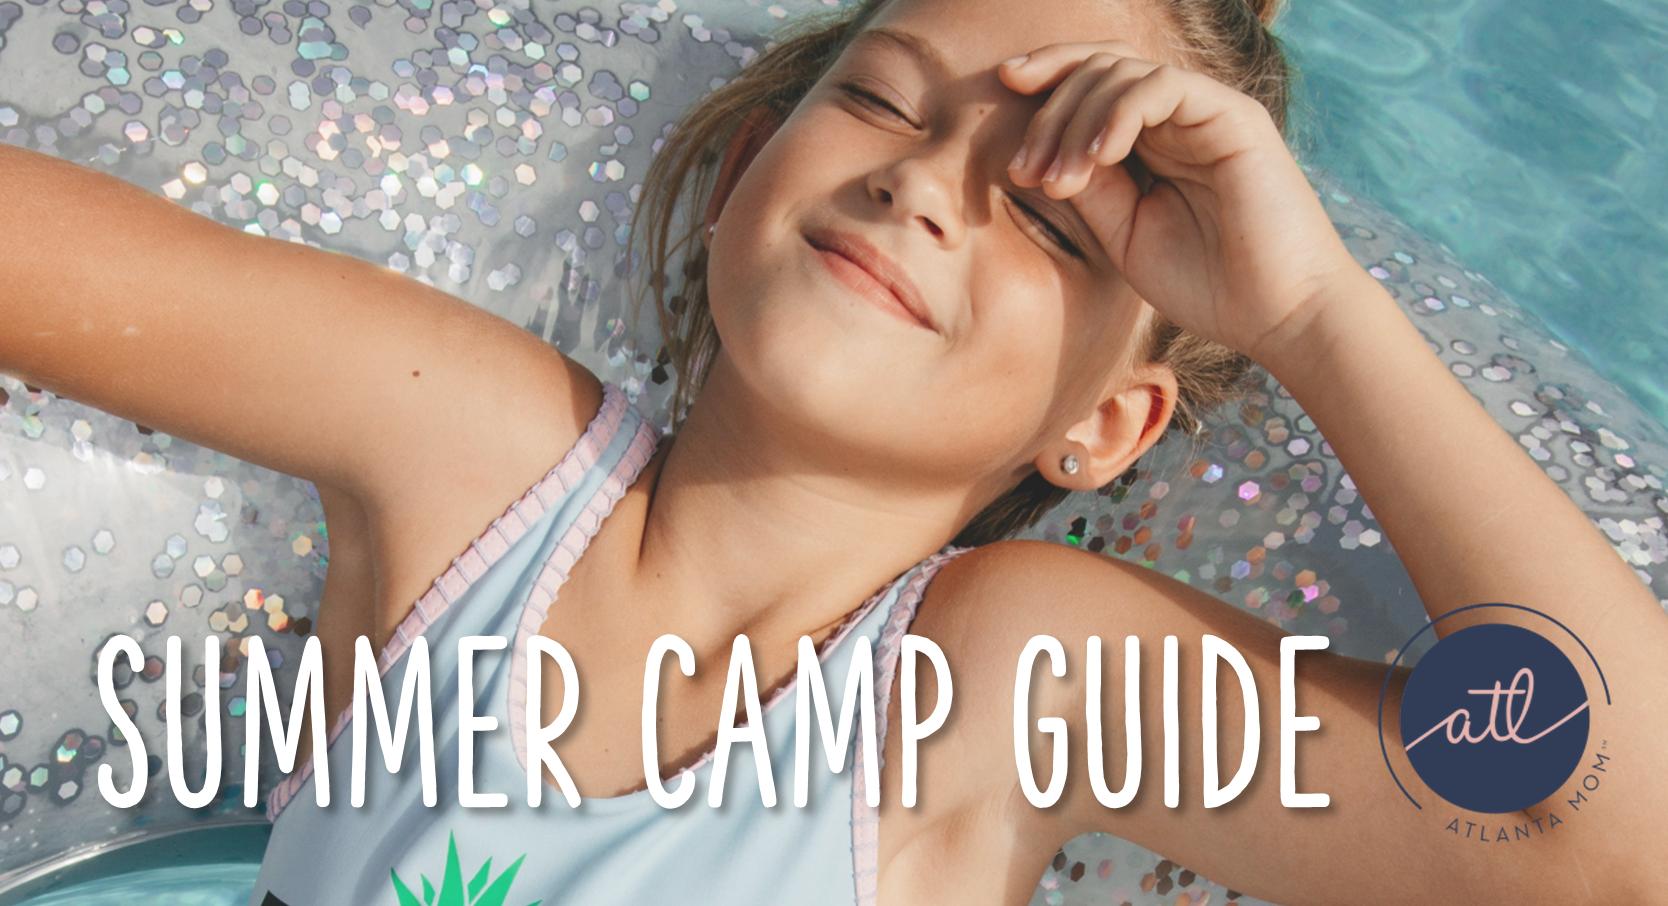 2021 Atlanta Summer Camp Guide